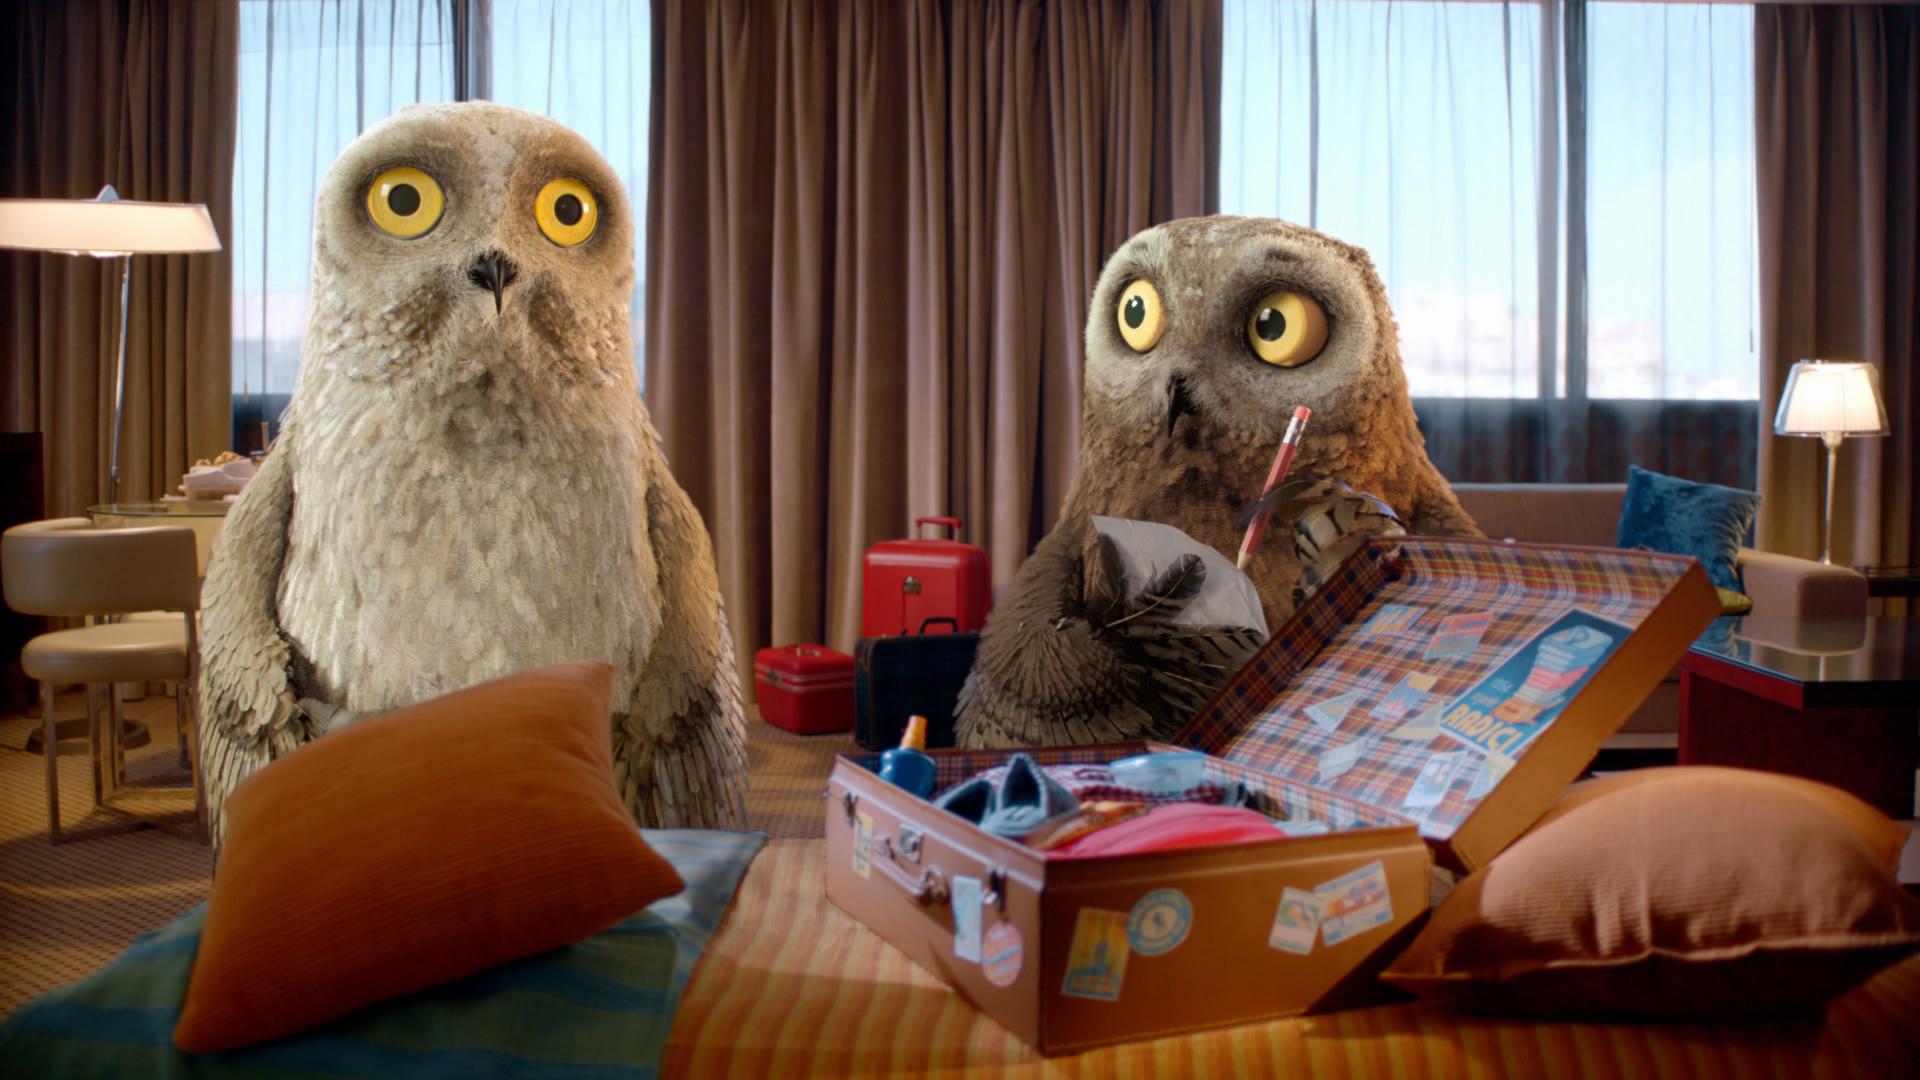 Winbank - Owls